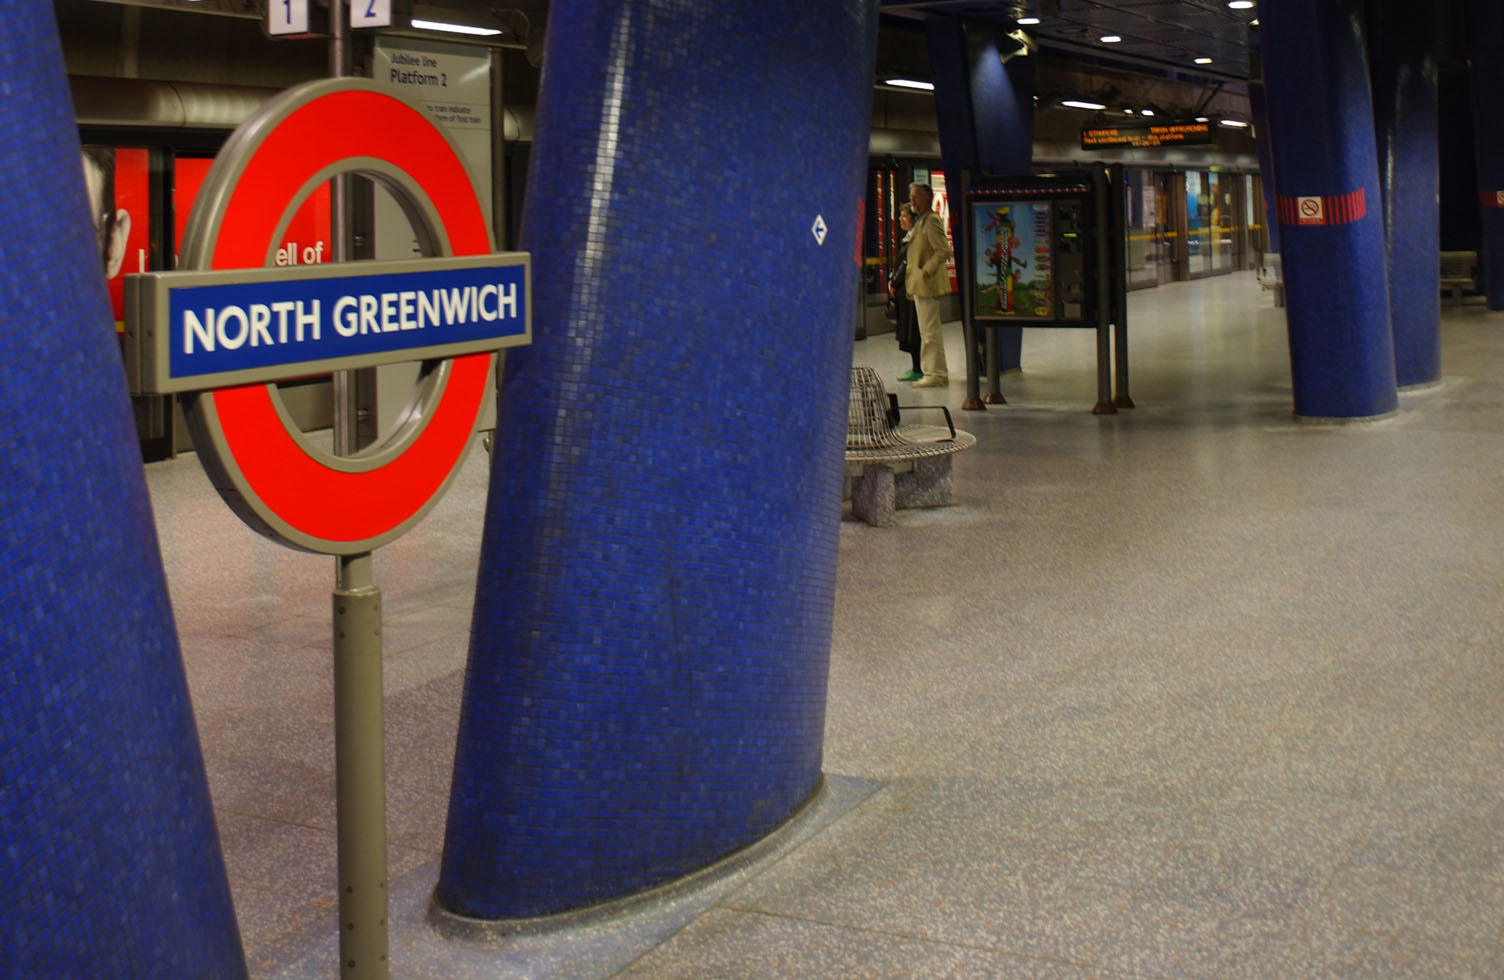 0265_North_Greenwich (7).jpg